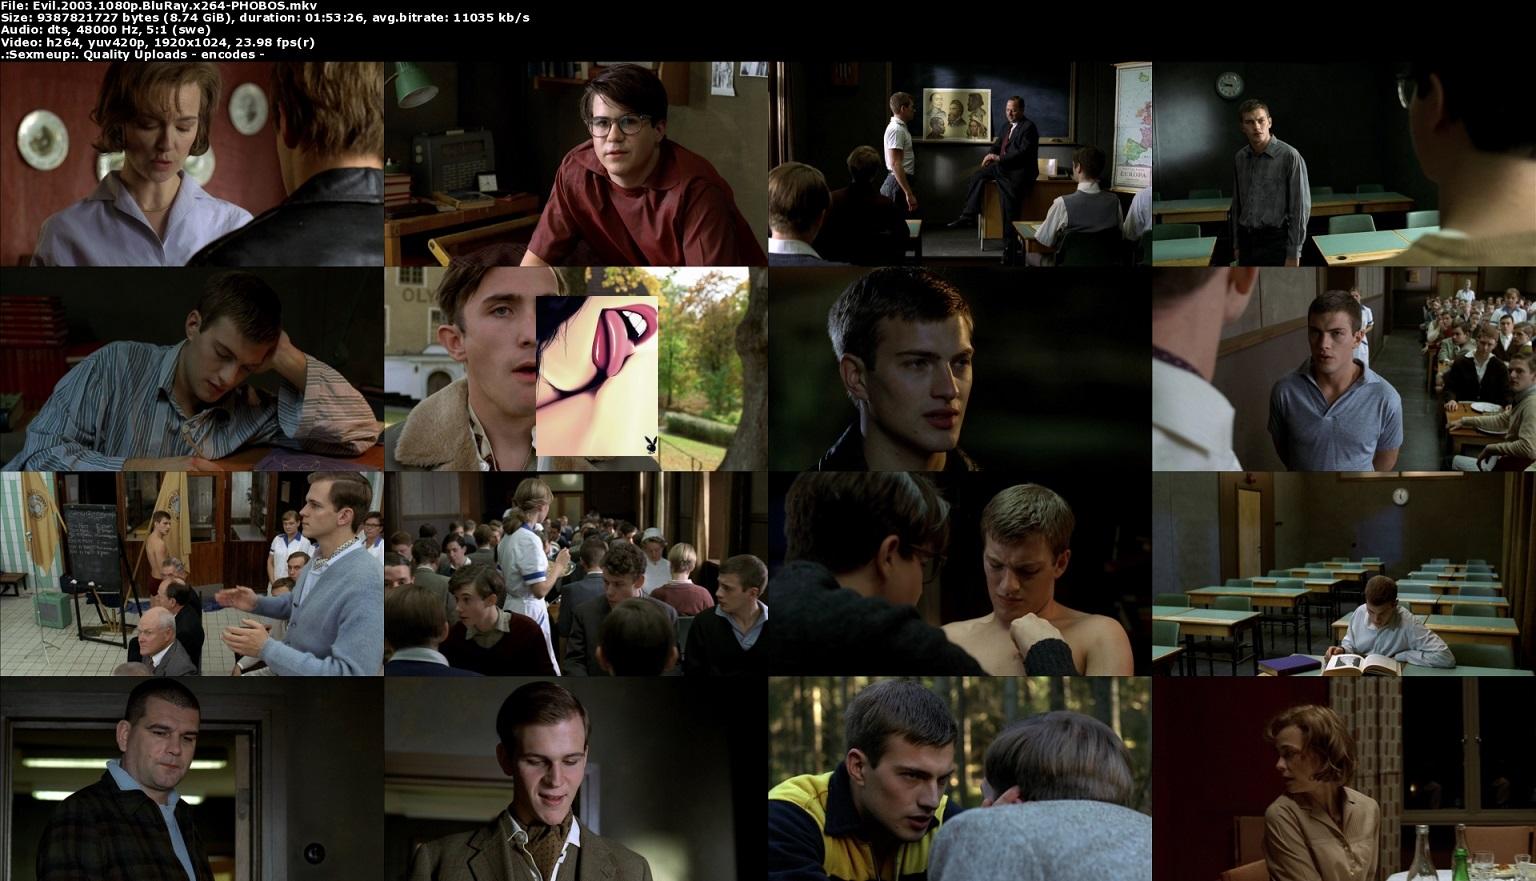 Evil.2003.1080p.BluRay.x264-PHOBOS_s.jpg